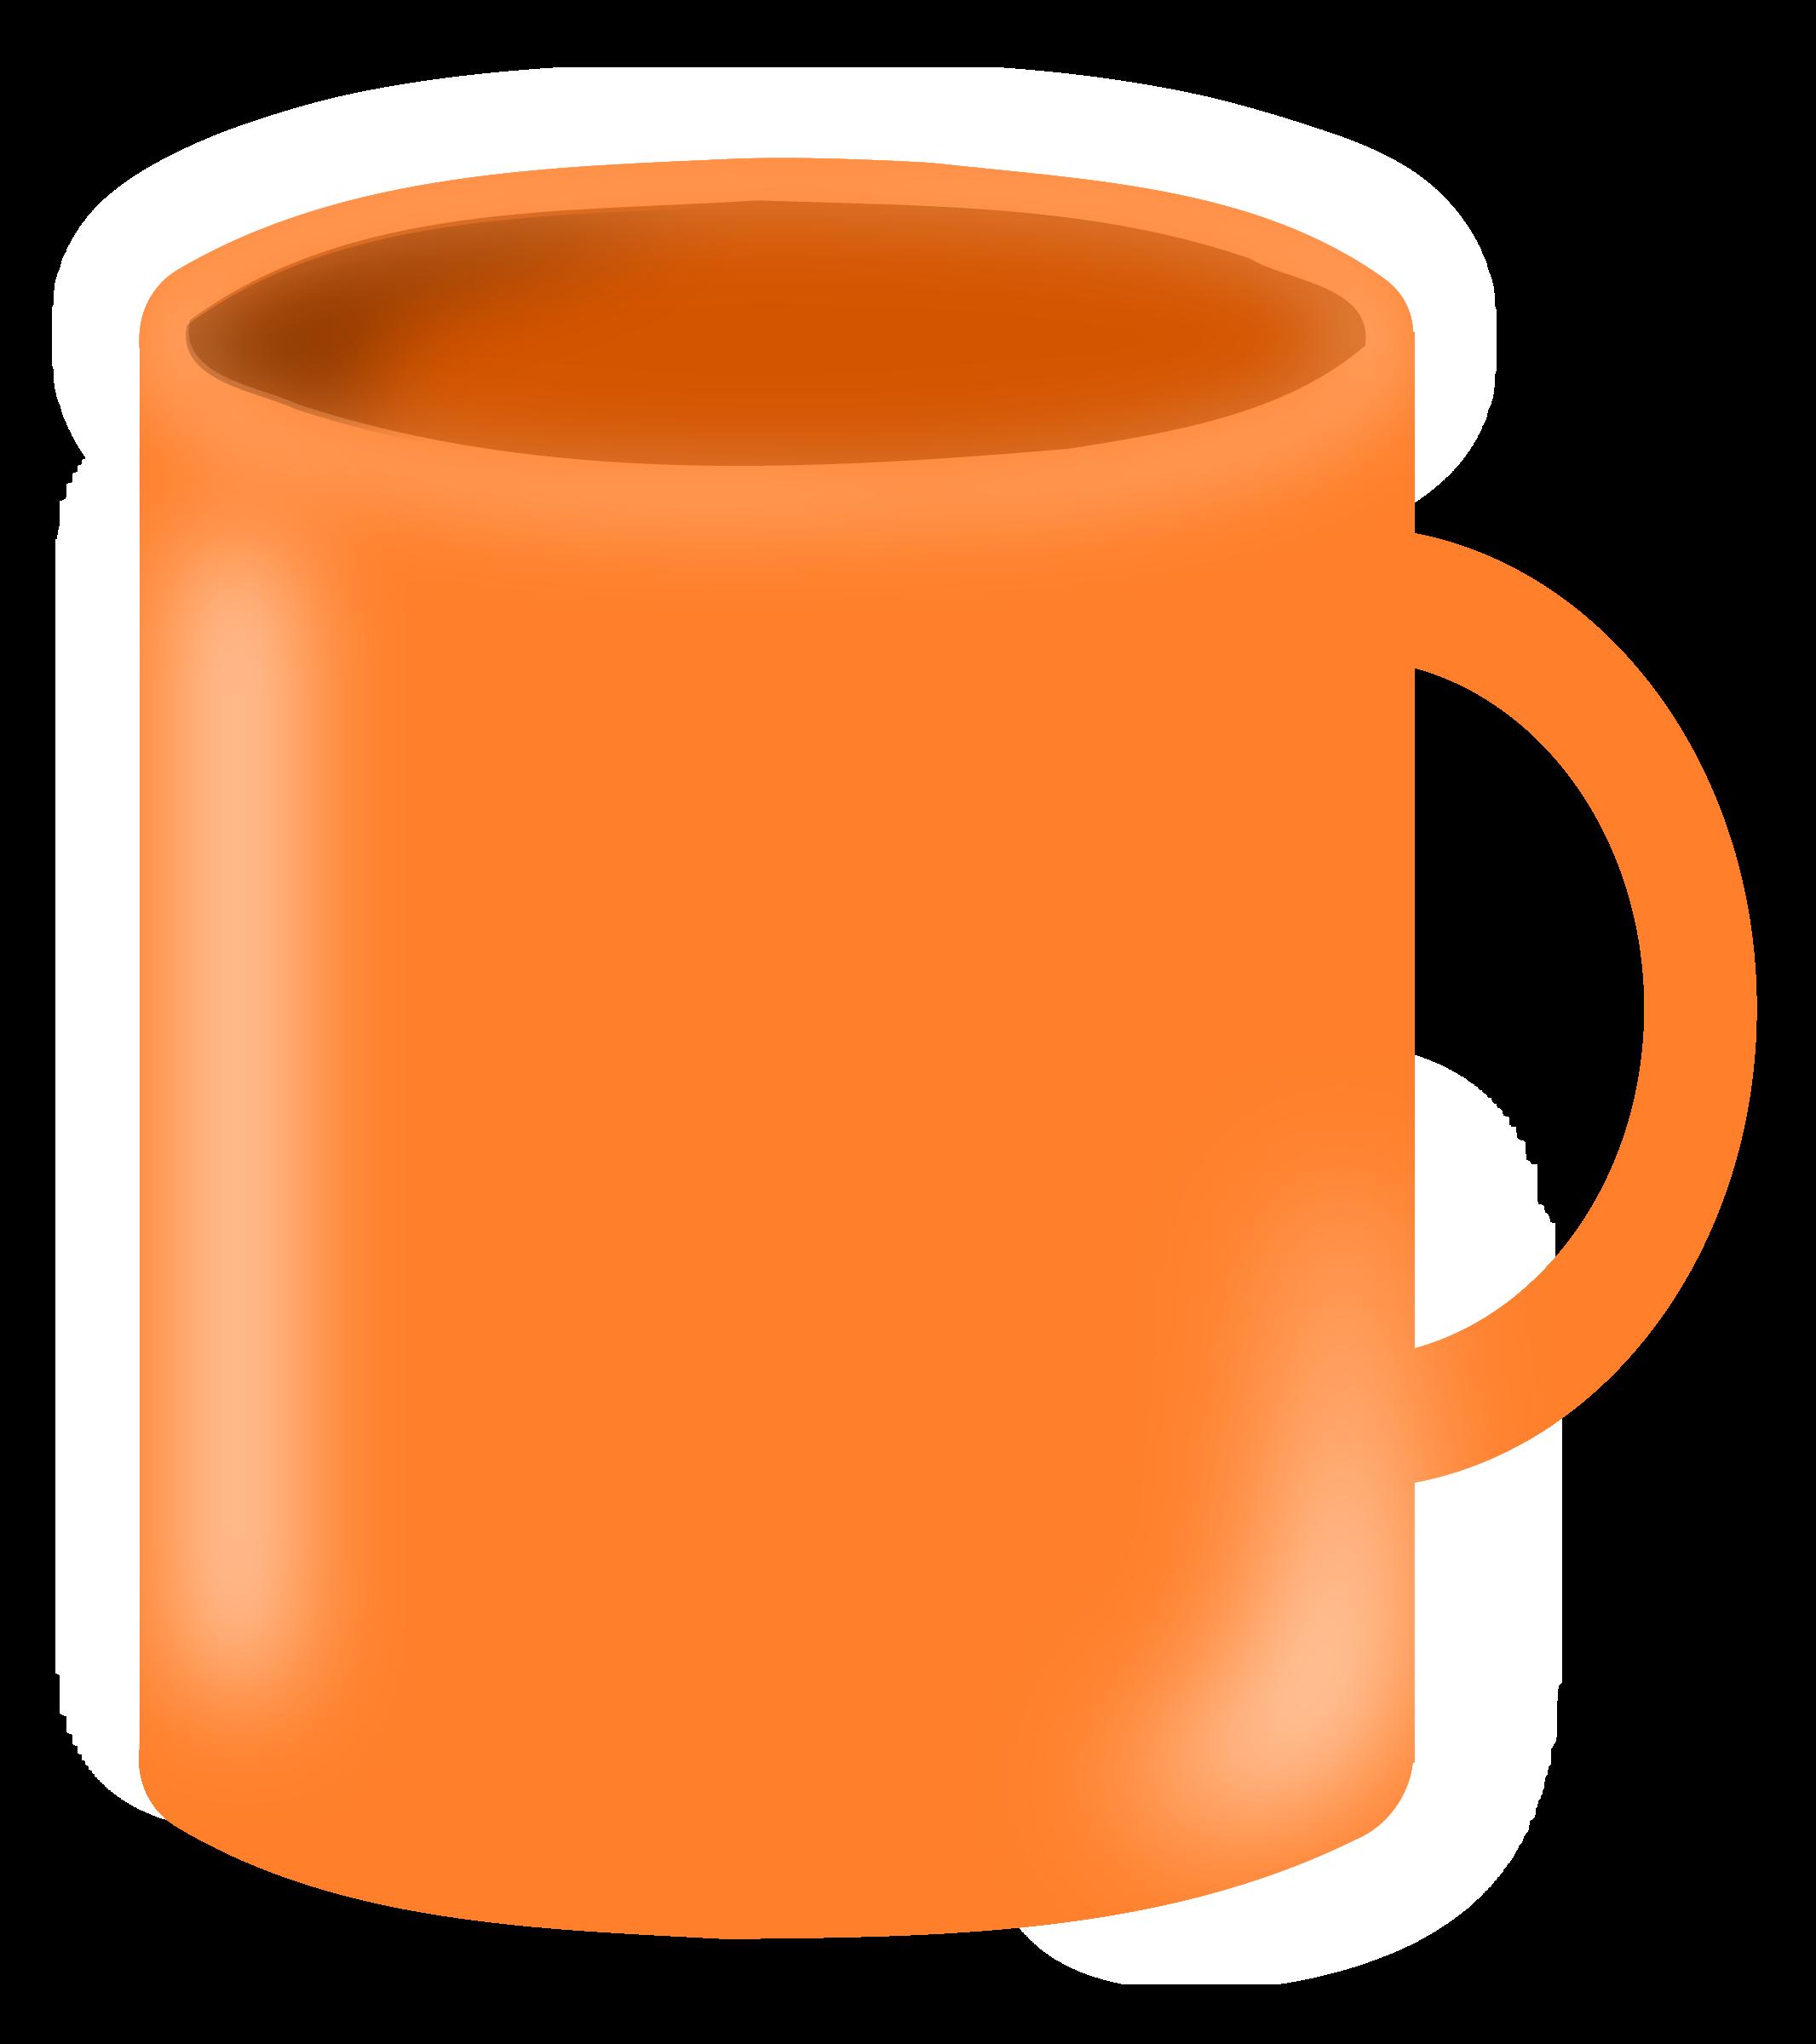 Mug clipart Clipart yenlung mug by mug